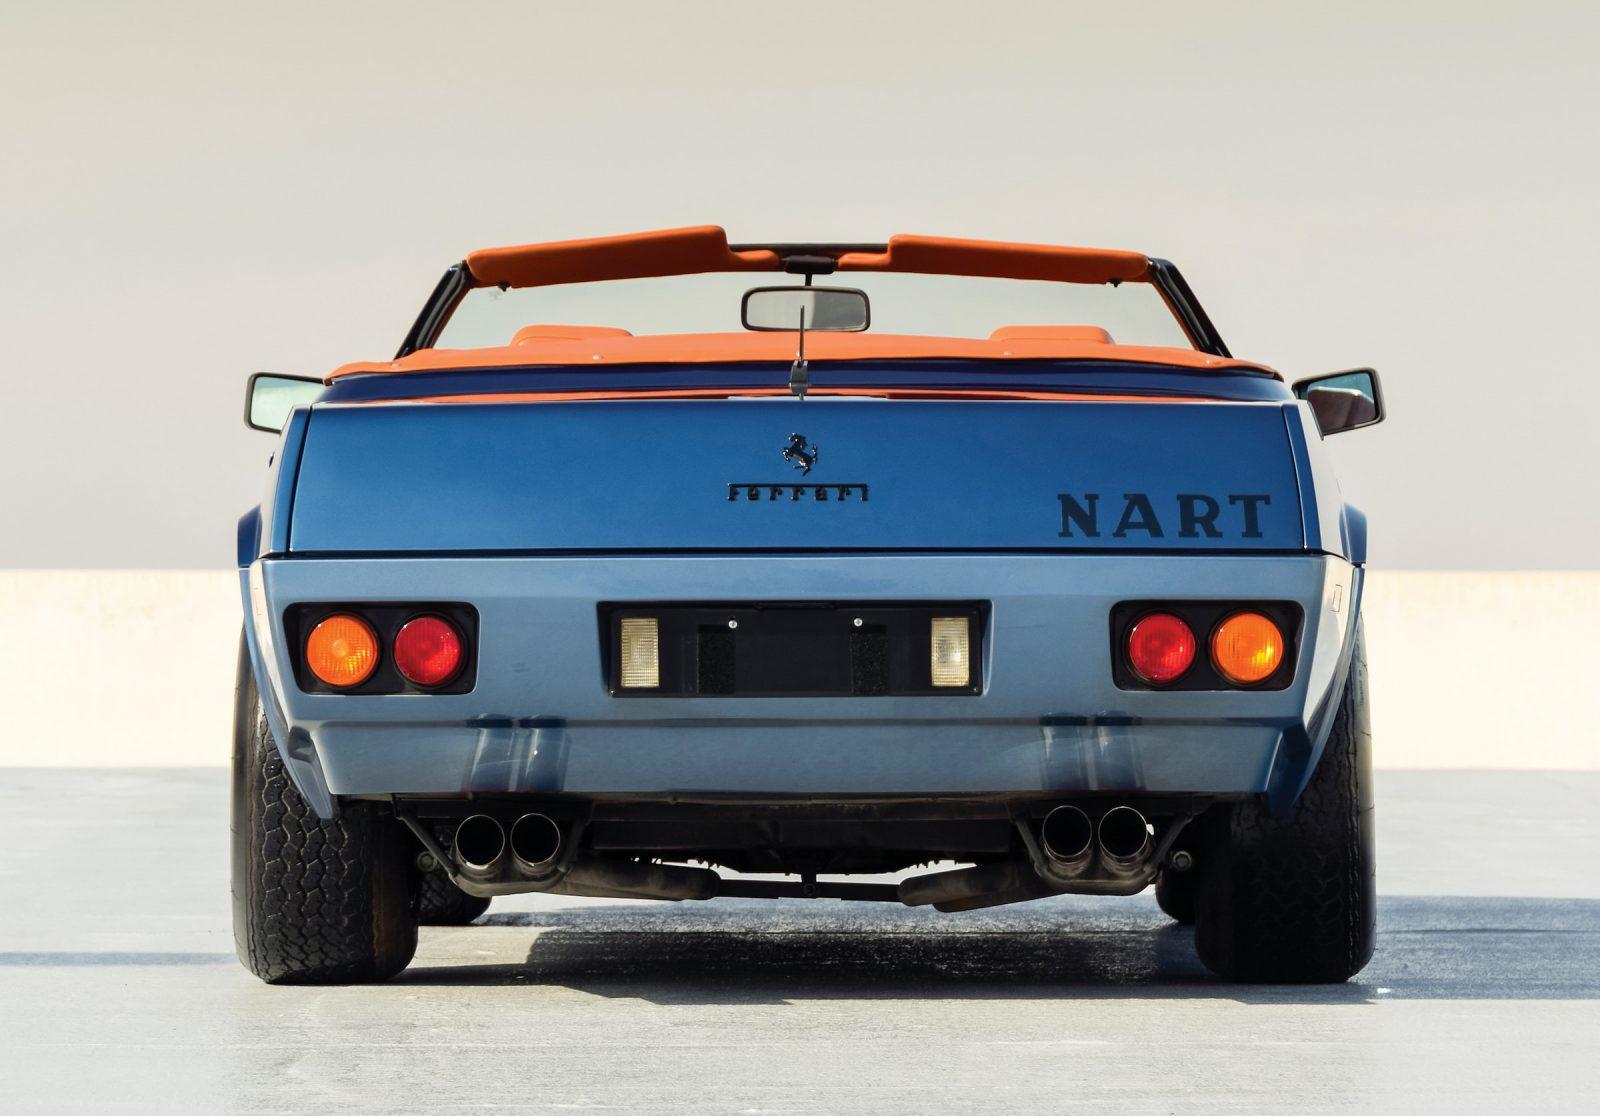 Ferrari 365 GTB/4 Daytona Spider N.A.R.T. - NARTisanat Italo-Américain... 33